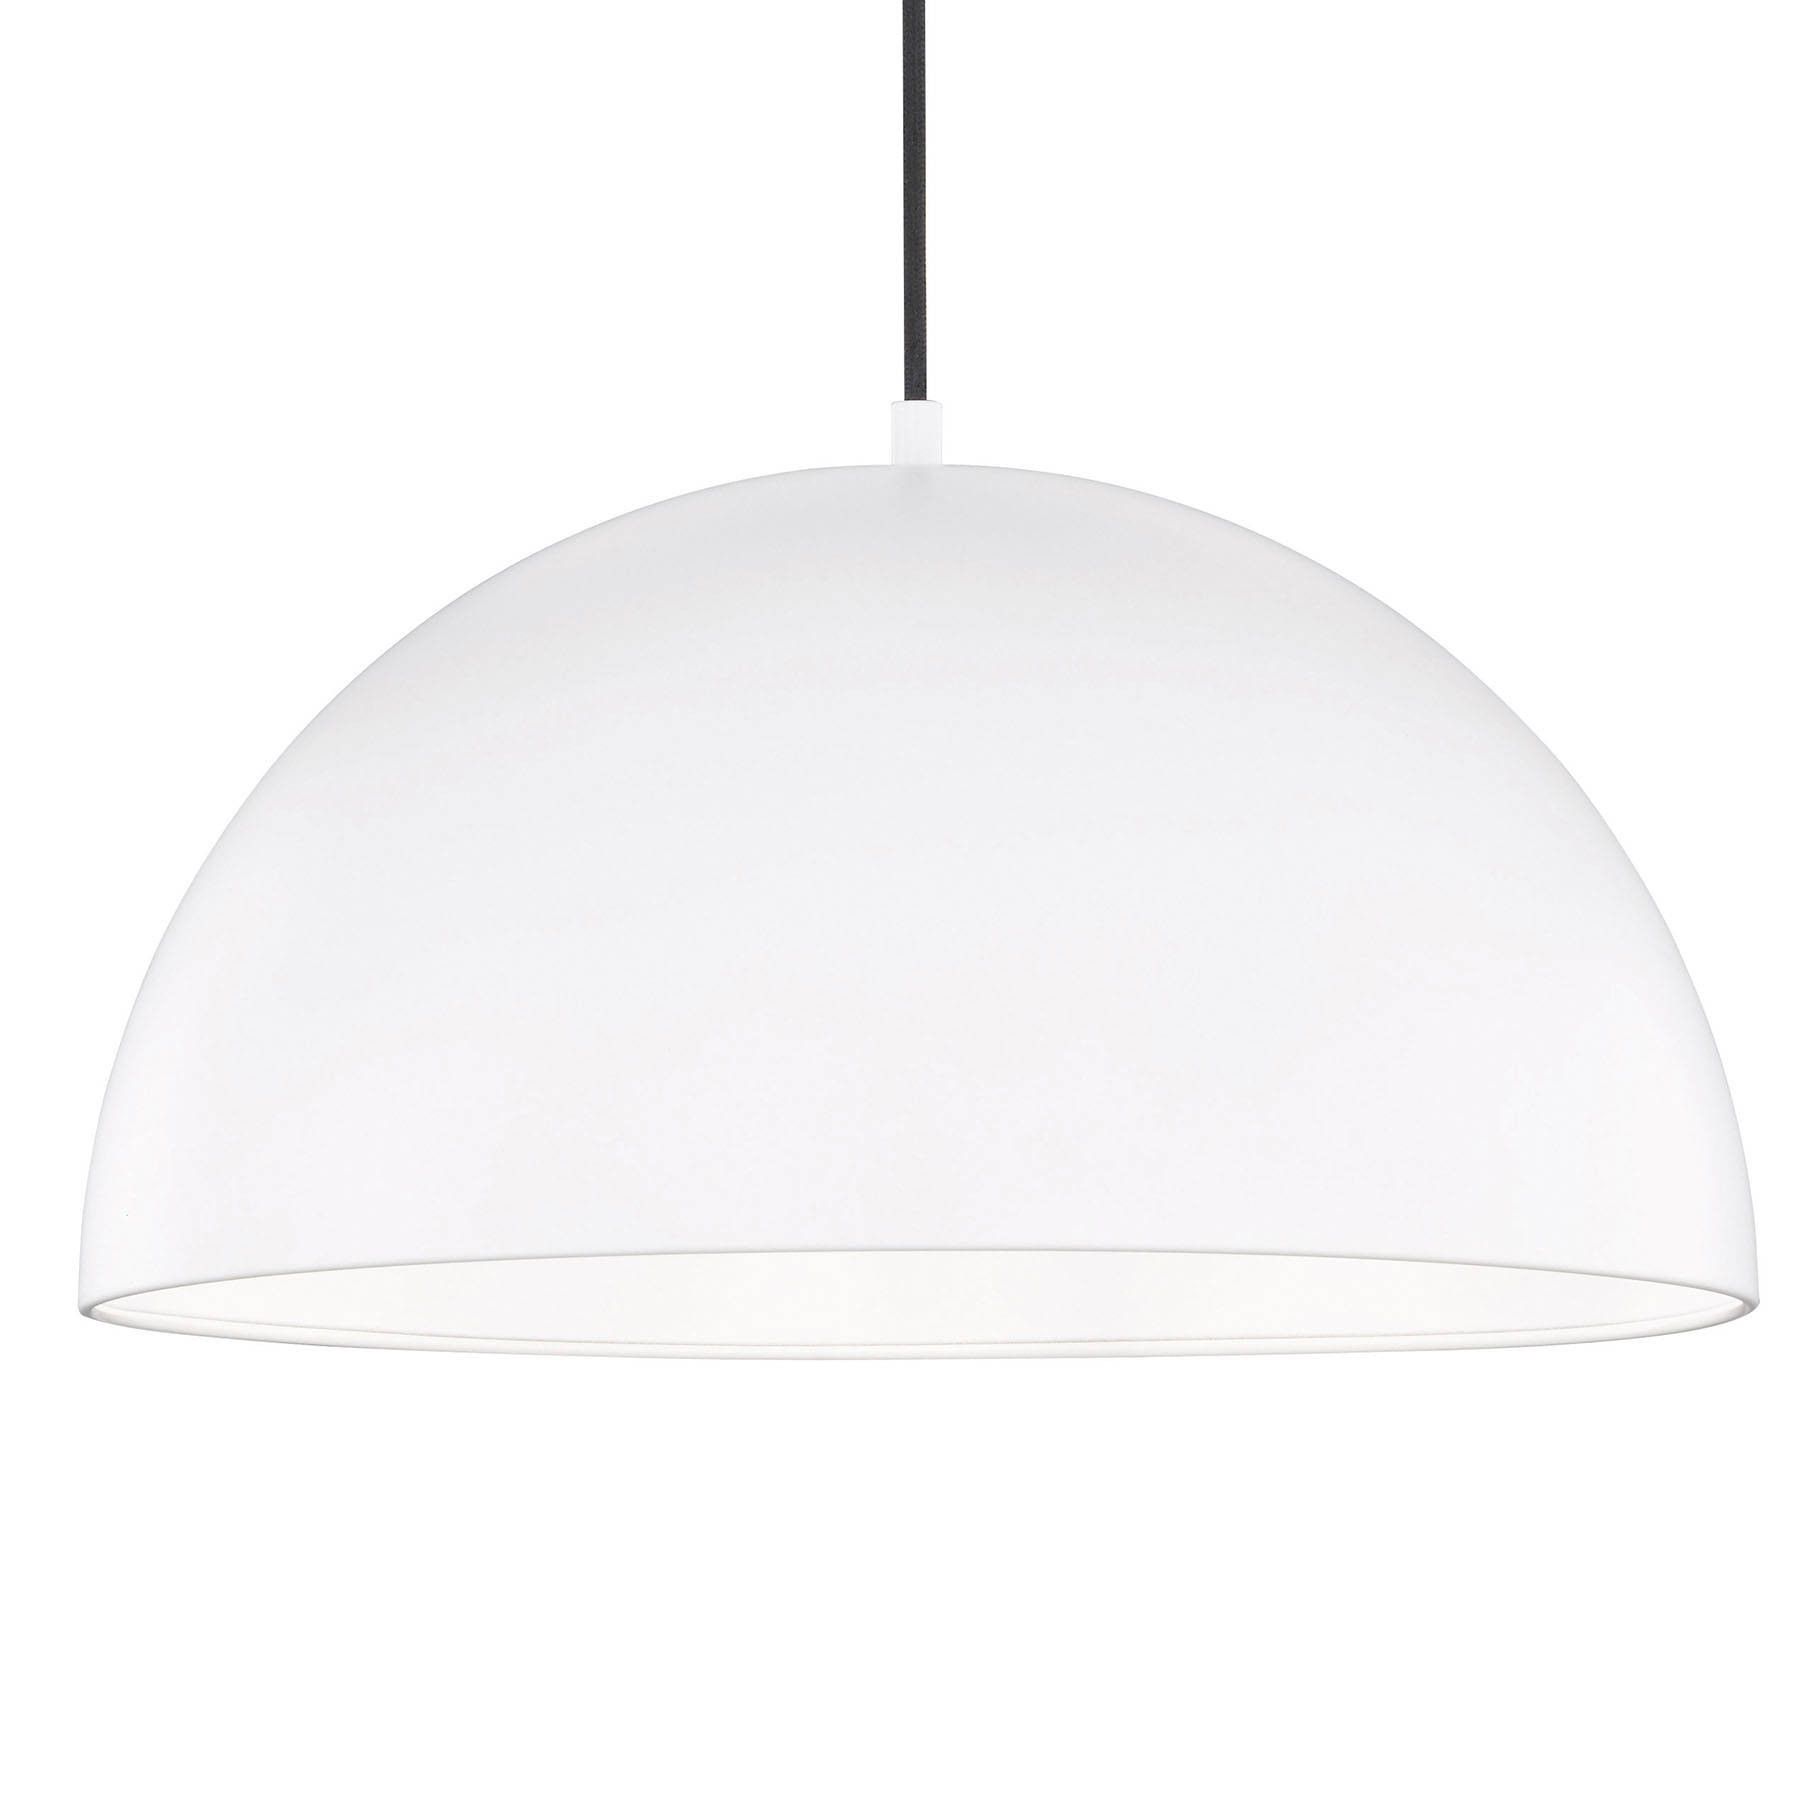 Mooier wonen Kia hanglamp wit